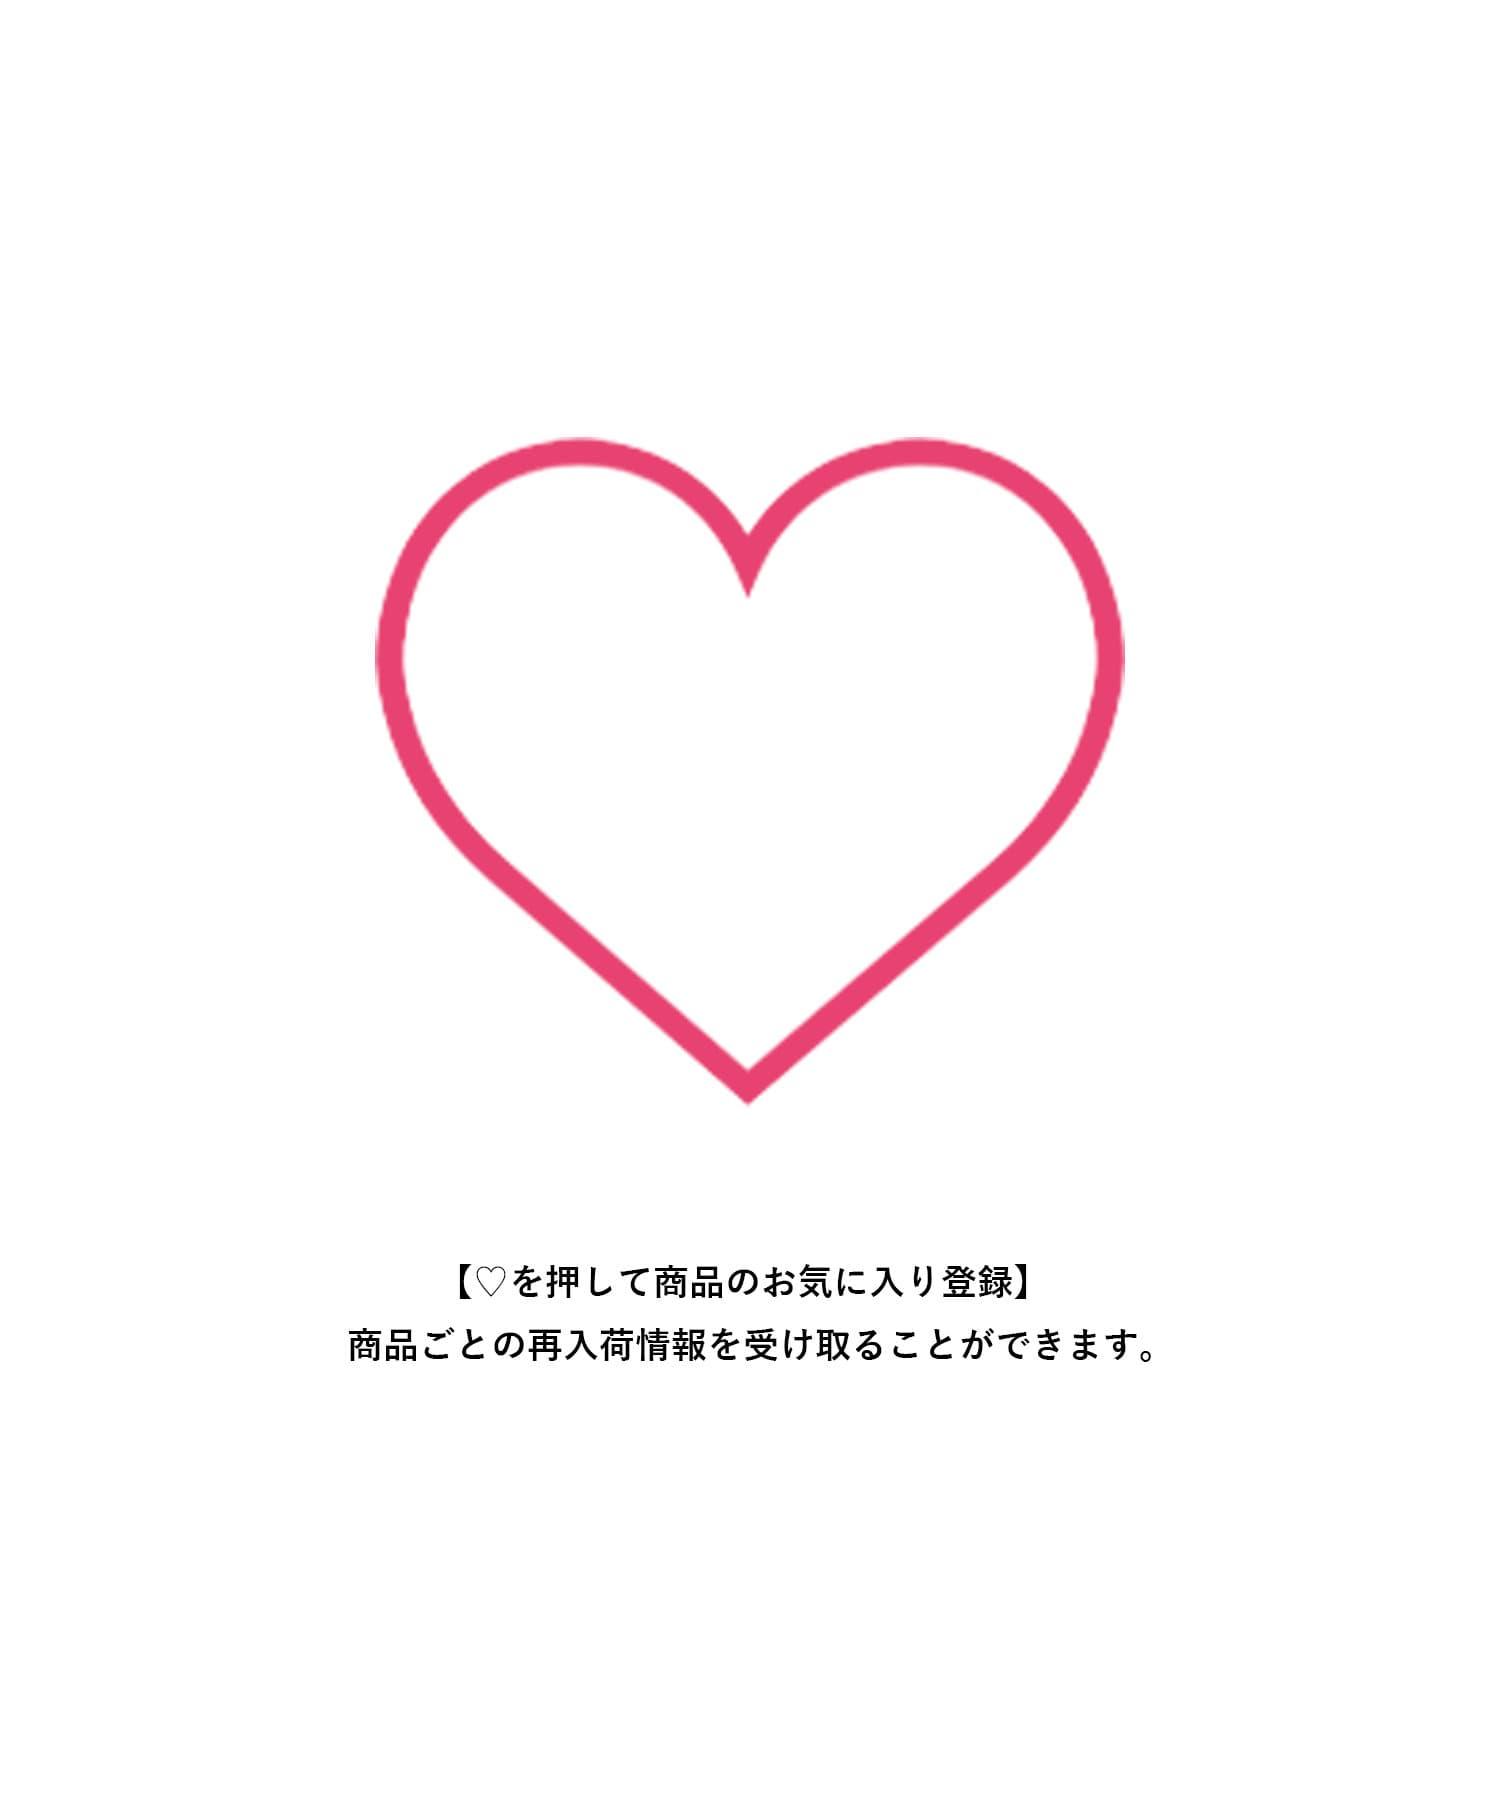 COLLAGE GALLARDAGALANTE(コラージュ ガリャルダガランテ) 【PAPILLONNER/パピヨネ】レザーベルトバングル